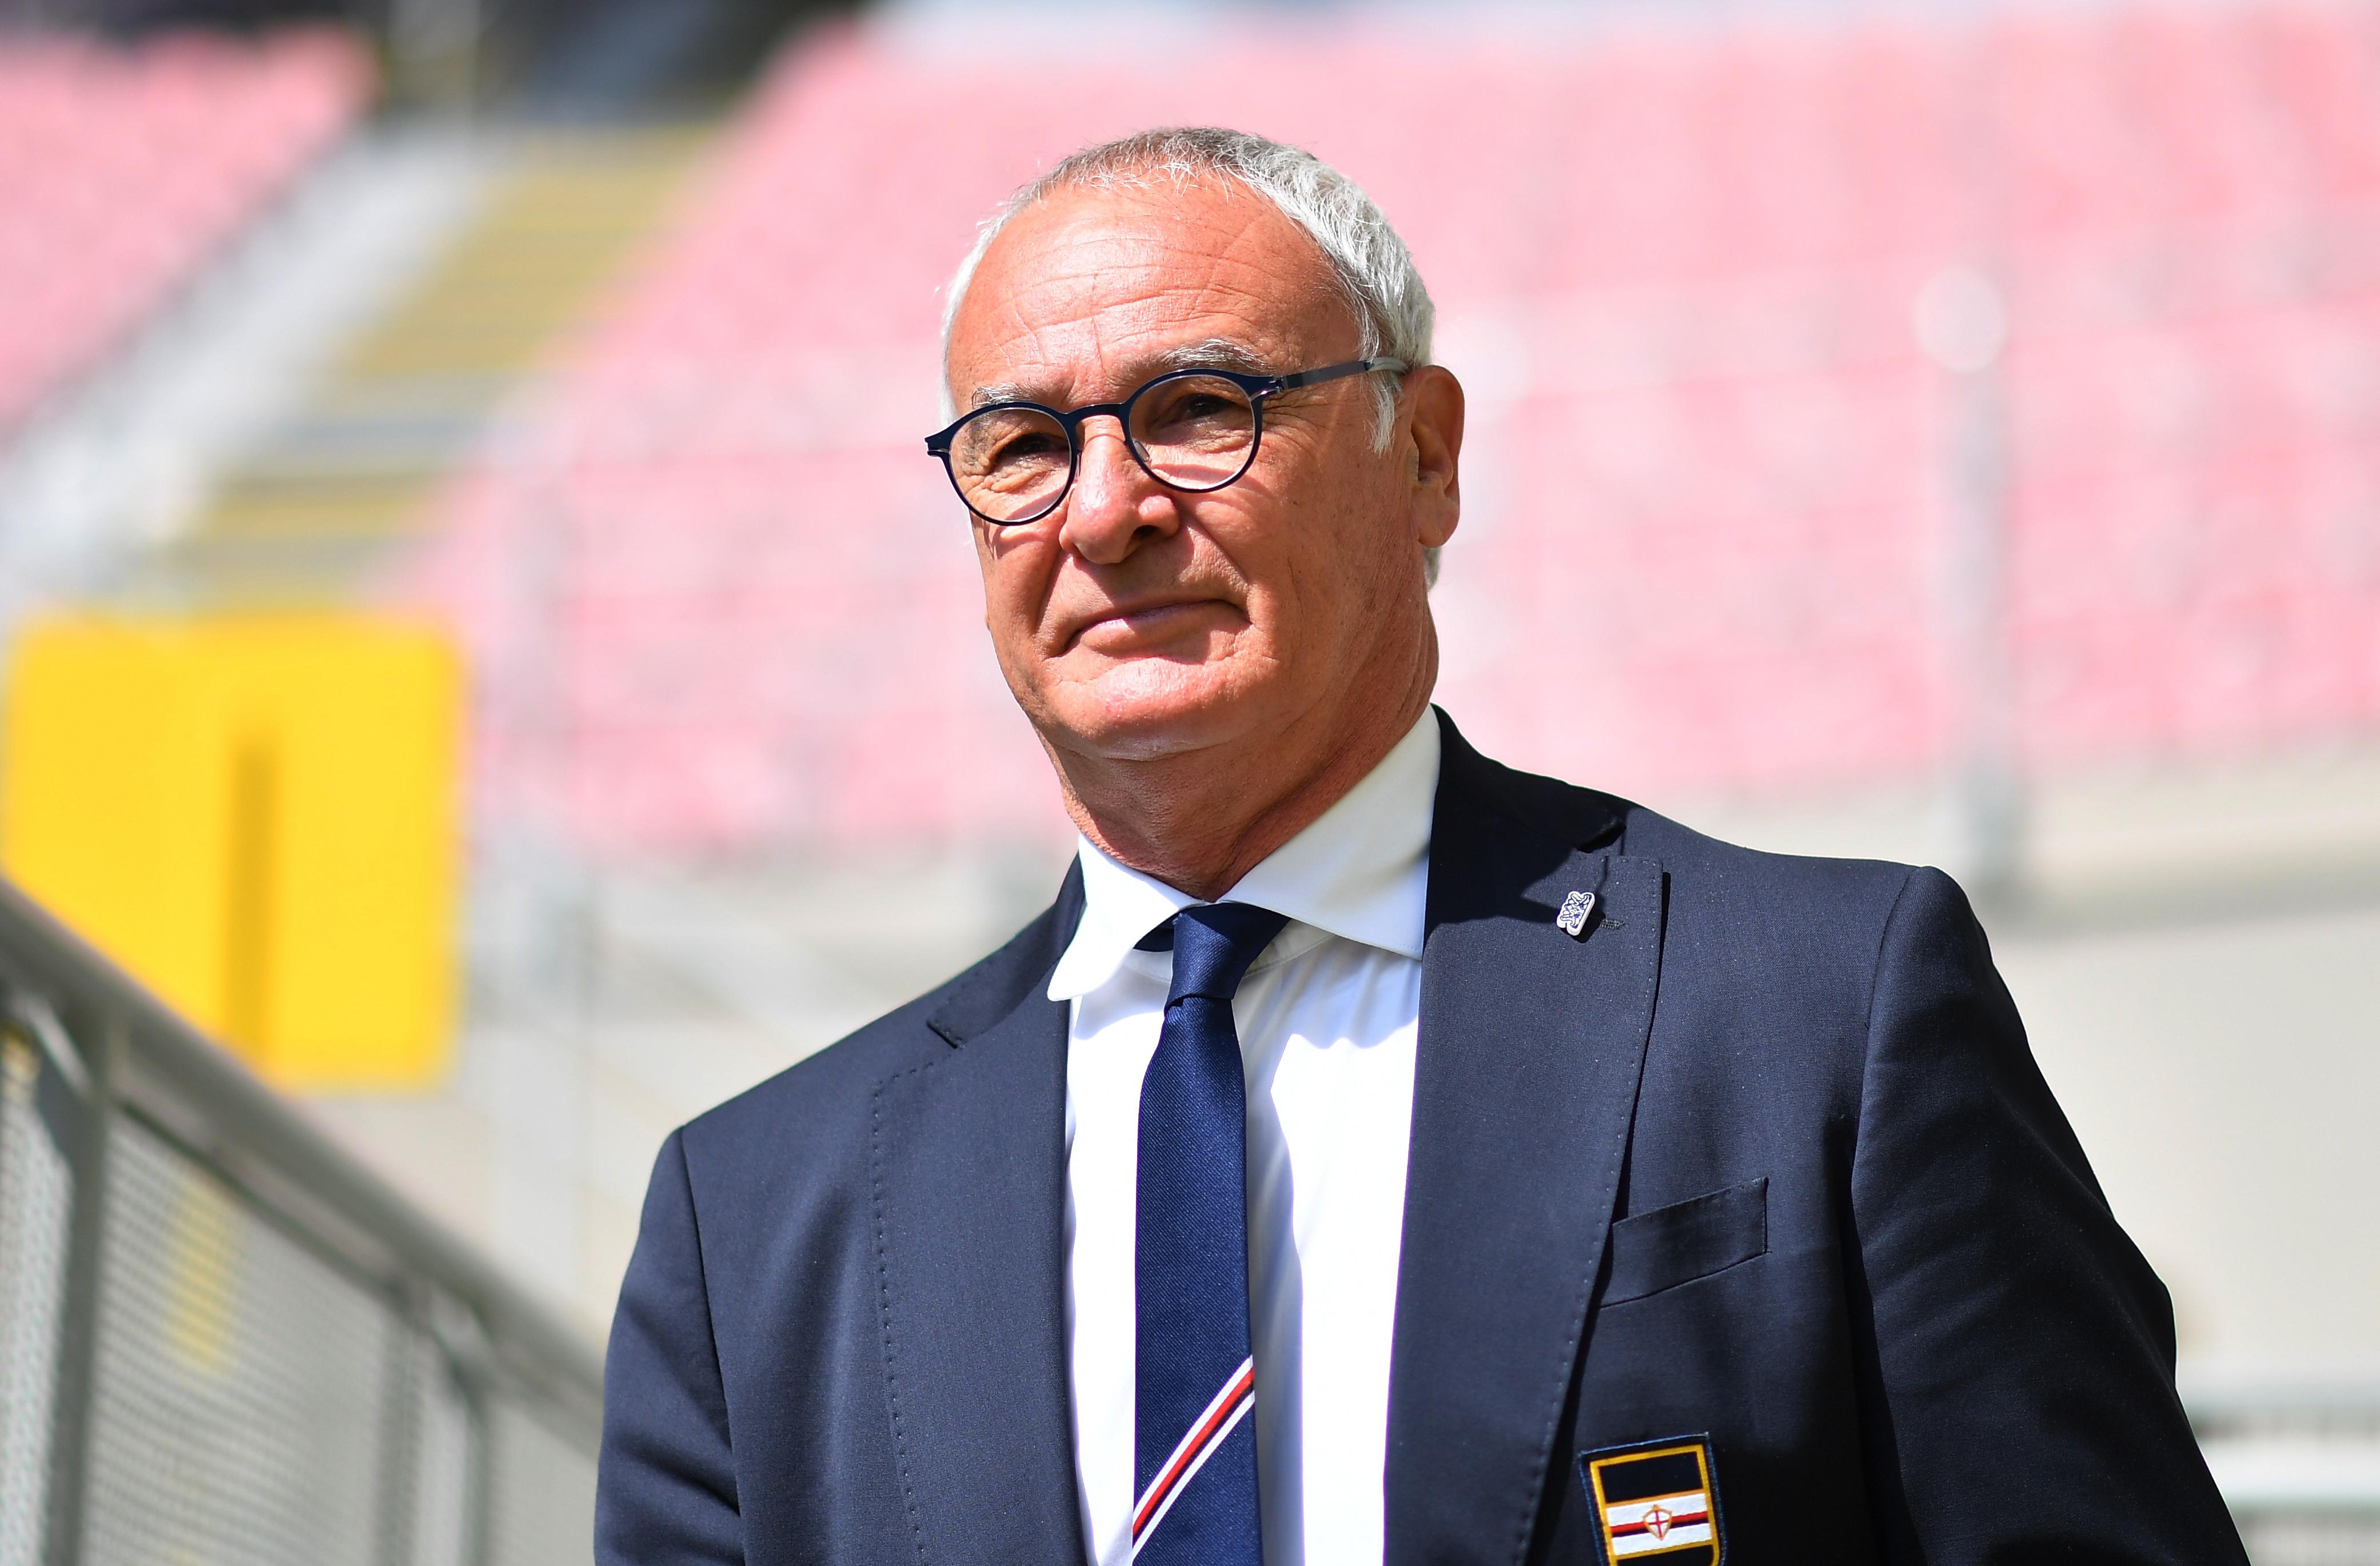 FILE PHOTO-Soccer Football - Serie A - AC Milan v Sampdoria - San Siro, Milan, Italy - April 3, 2021 Sampdoria coach Claudio Ranieri before the match REUTERS/Daniele Mascolo